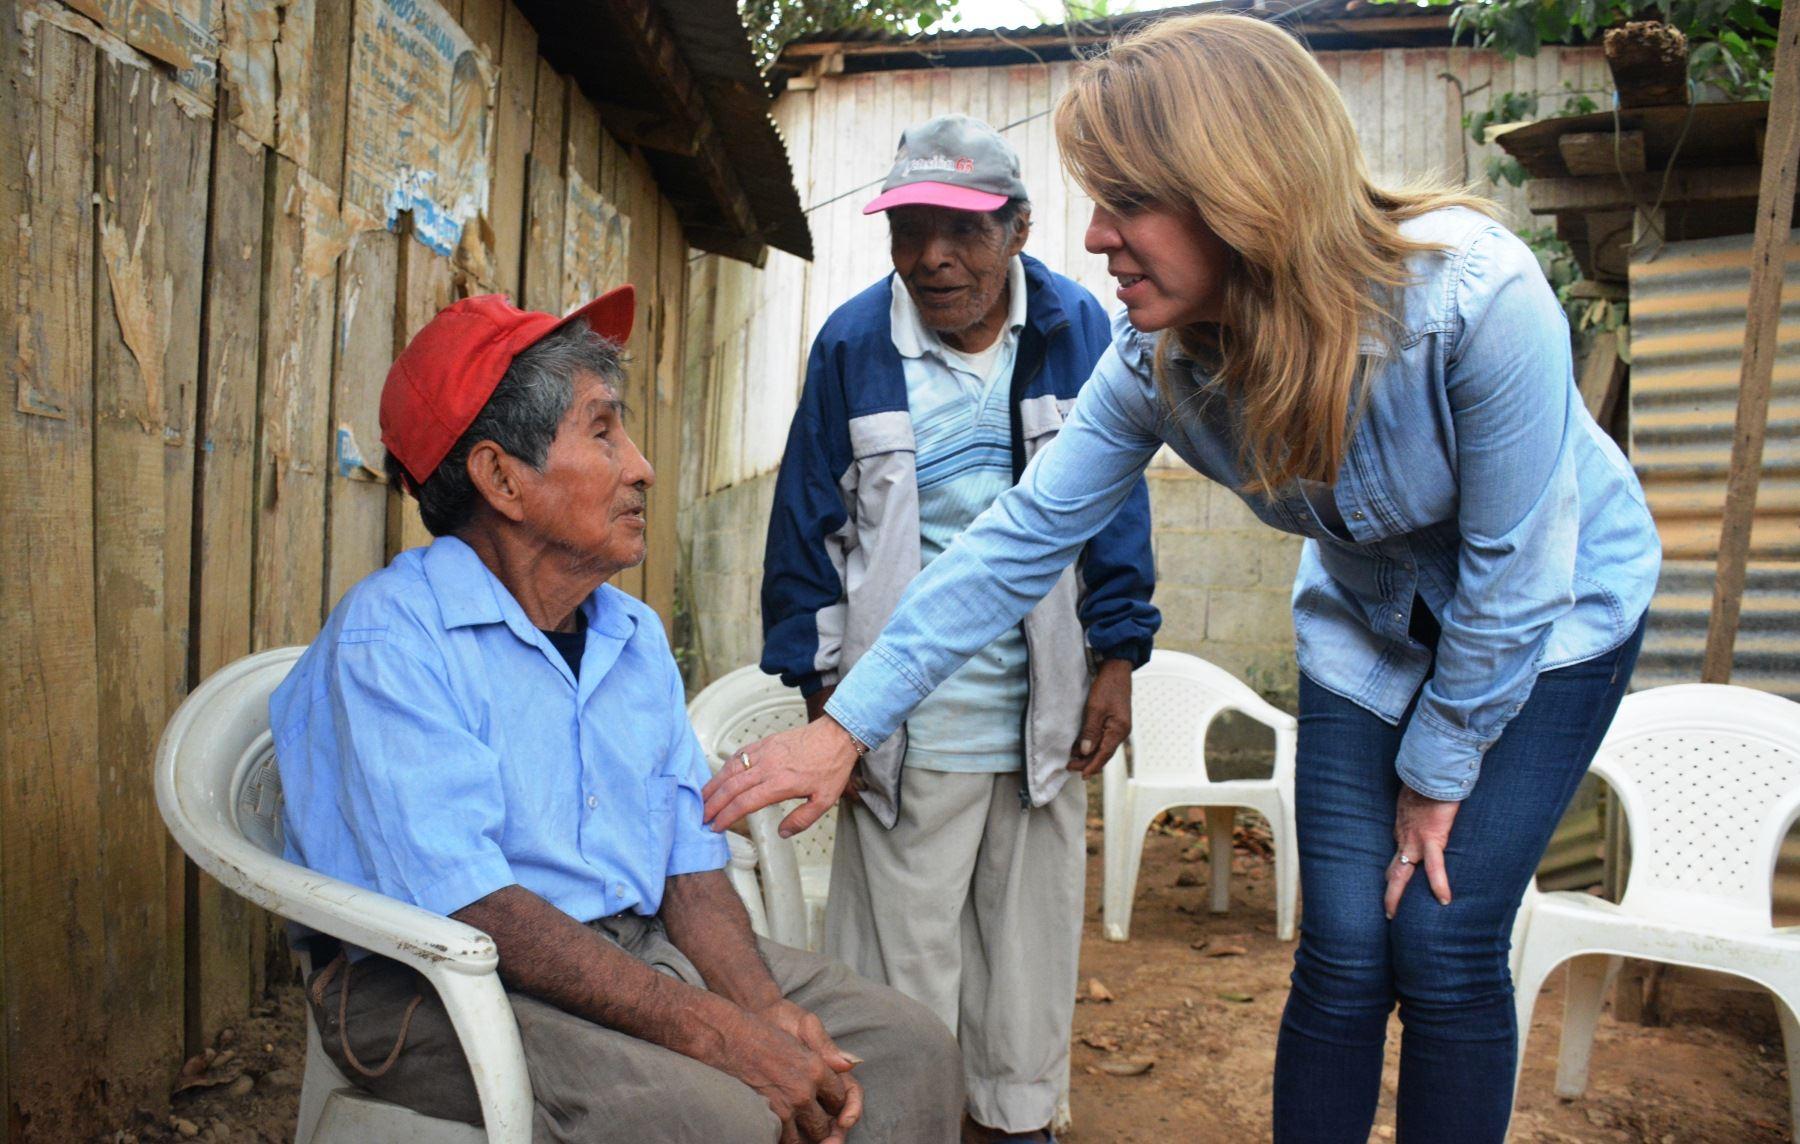 Ministra del Midis, Cayetana Aljovín, se entrevistó con usuarios de Pensión 65 en Madre de Dios.